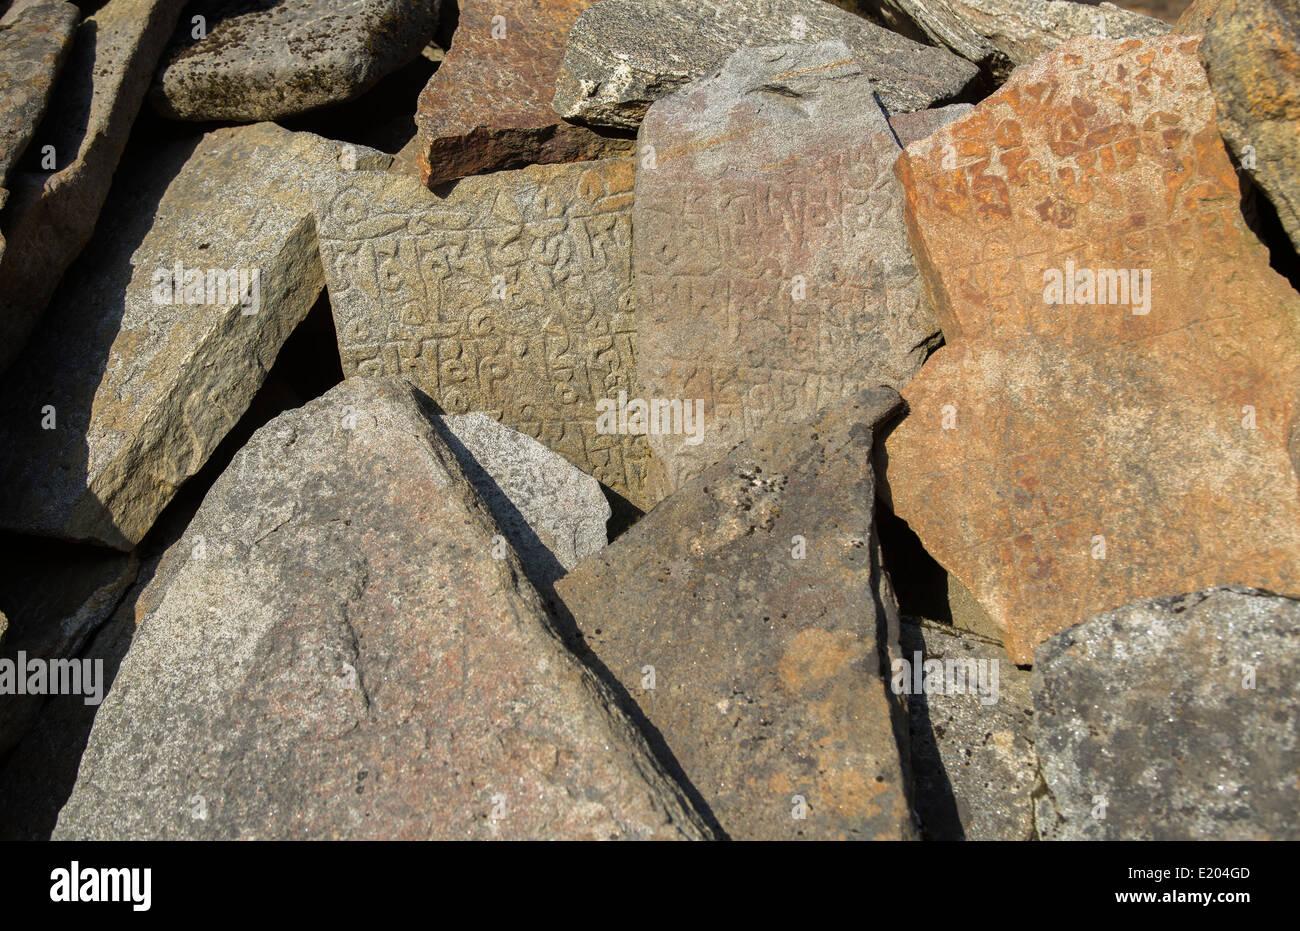 Nepal Mani stones on a Mani Wall in Khumjung Solukhumbu, remote, Mt Everest, Himalayas - Stock Image